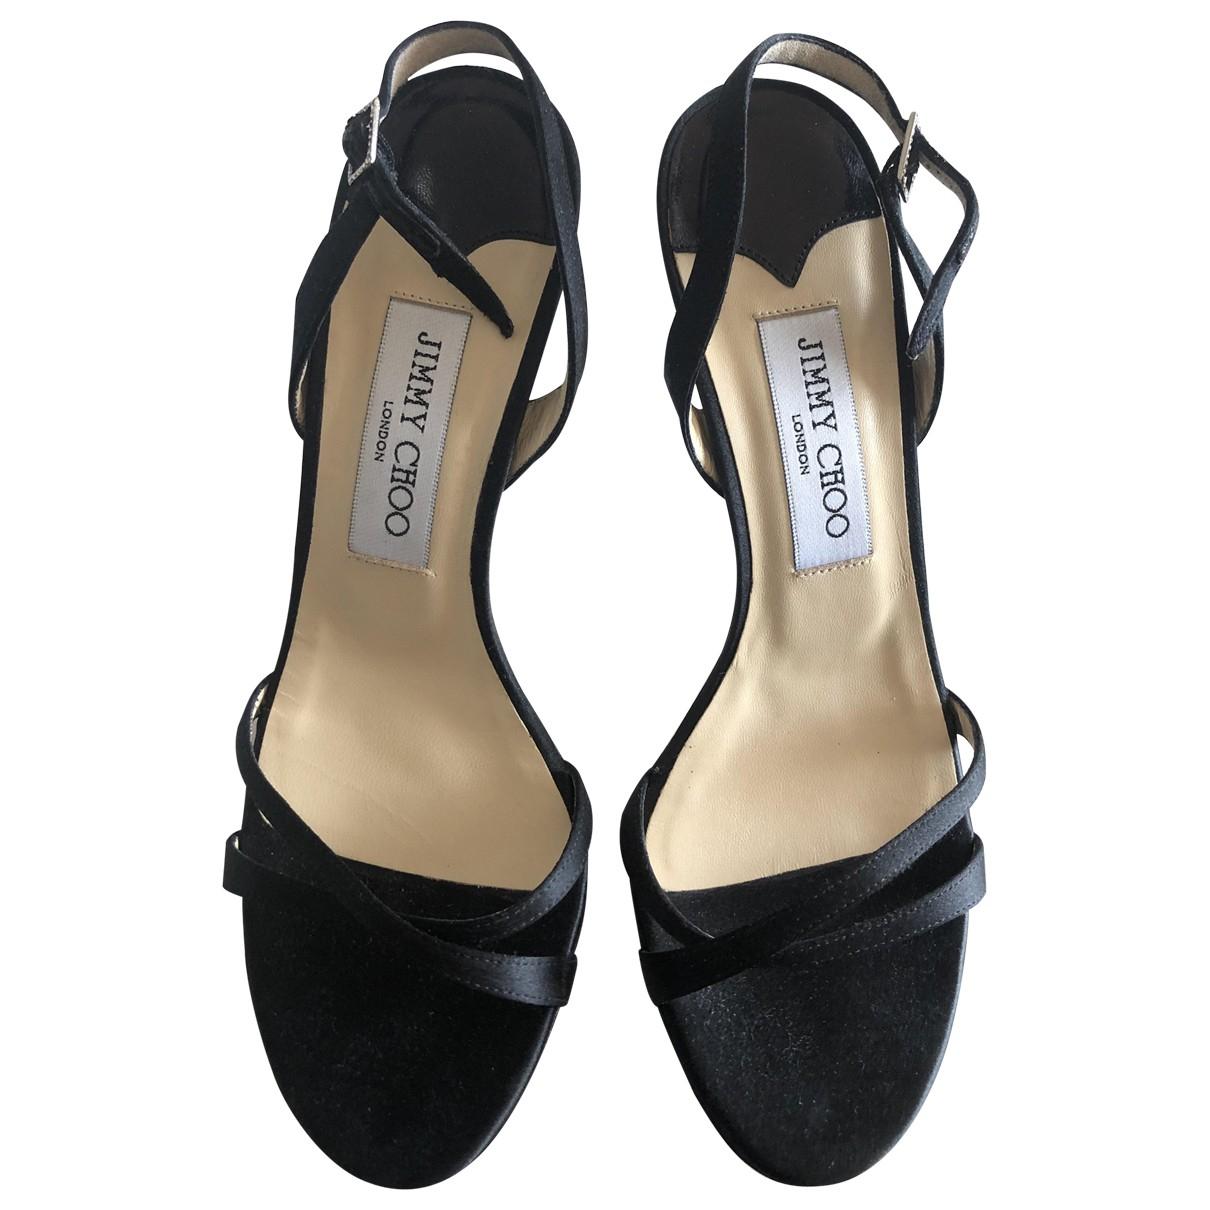 Jimmy Choo N Black Cloth Sandals for Women 37.5 EU